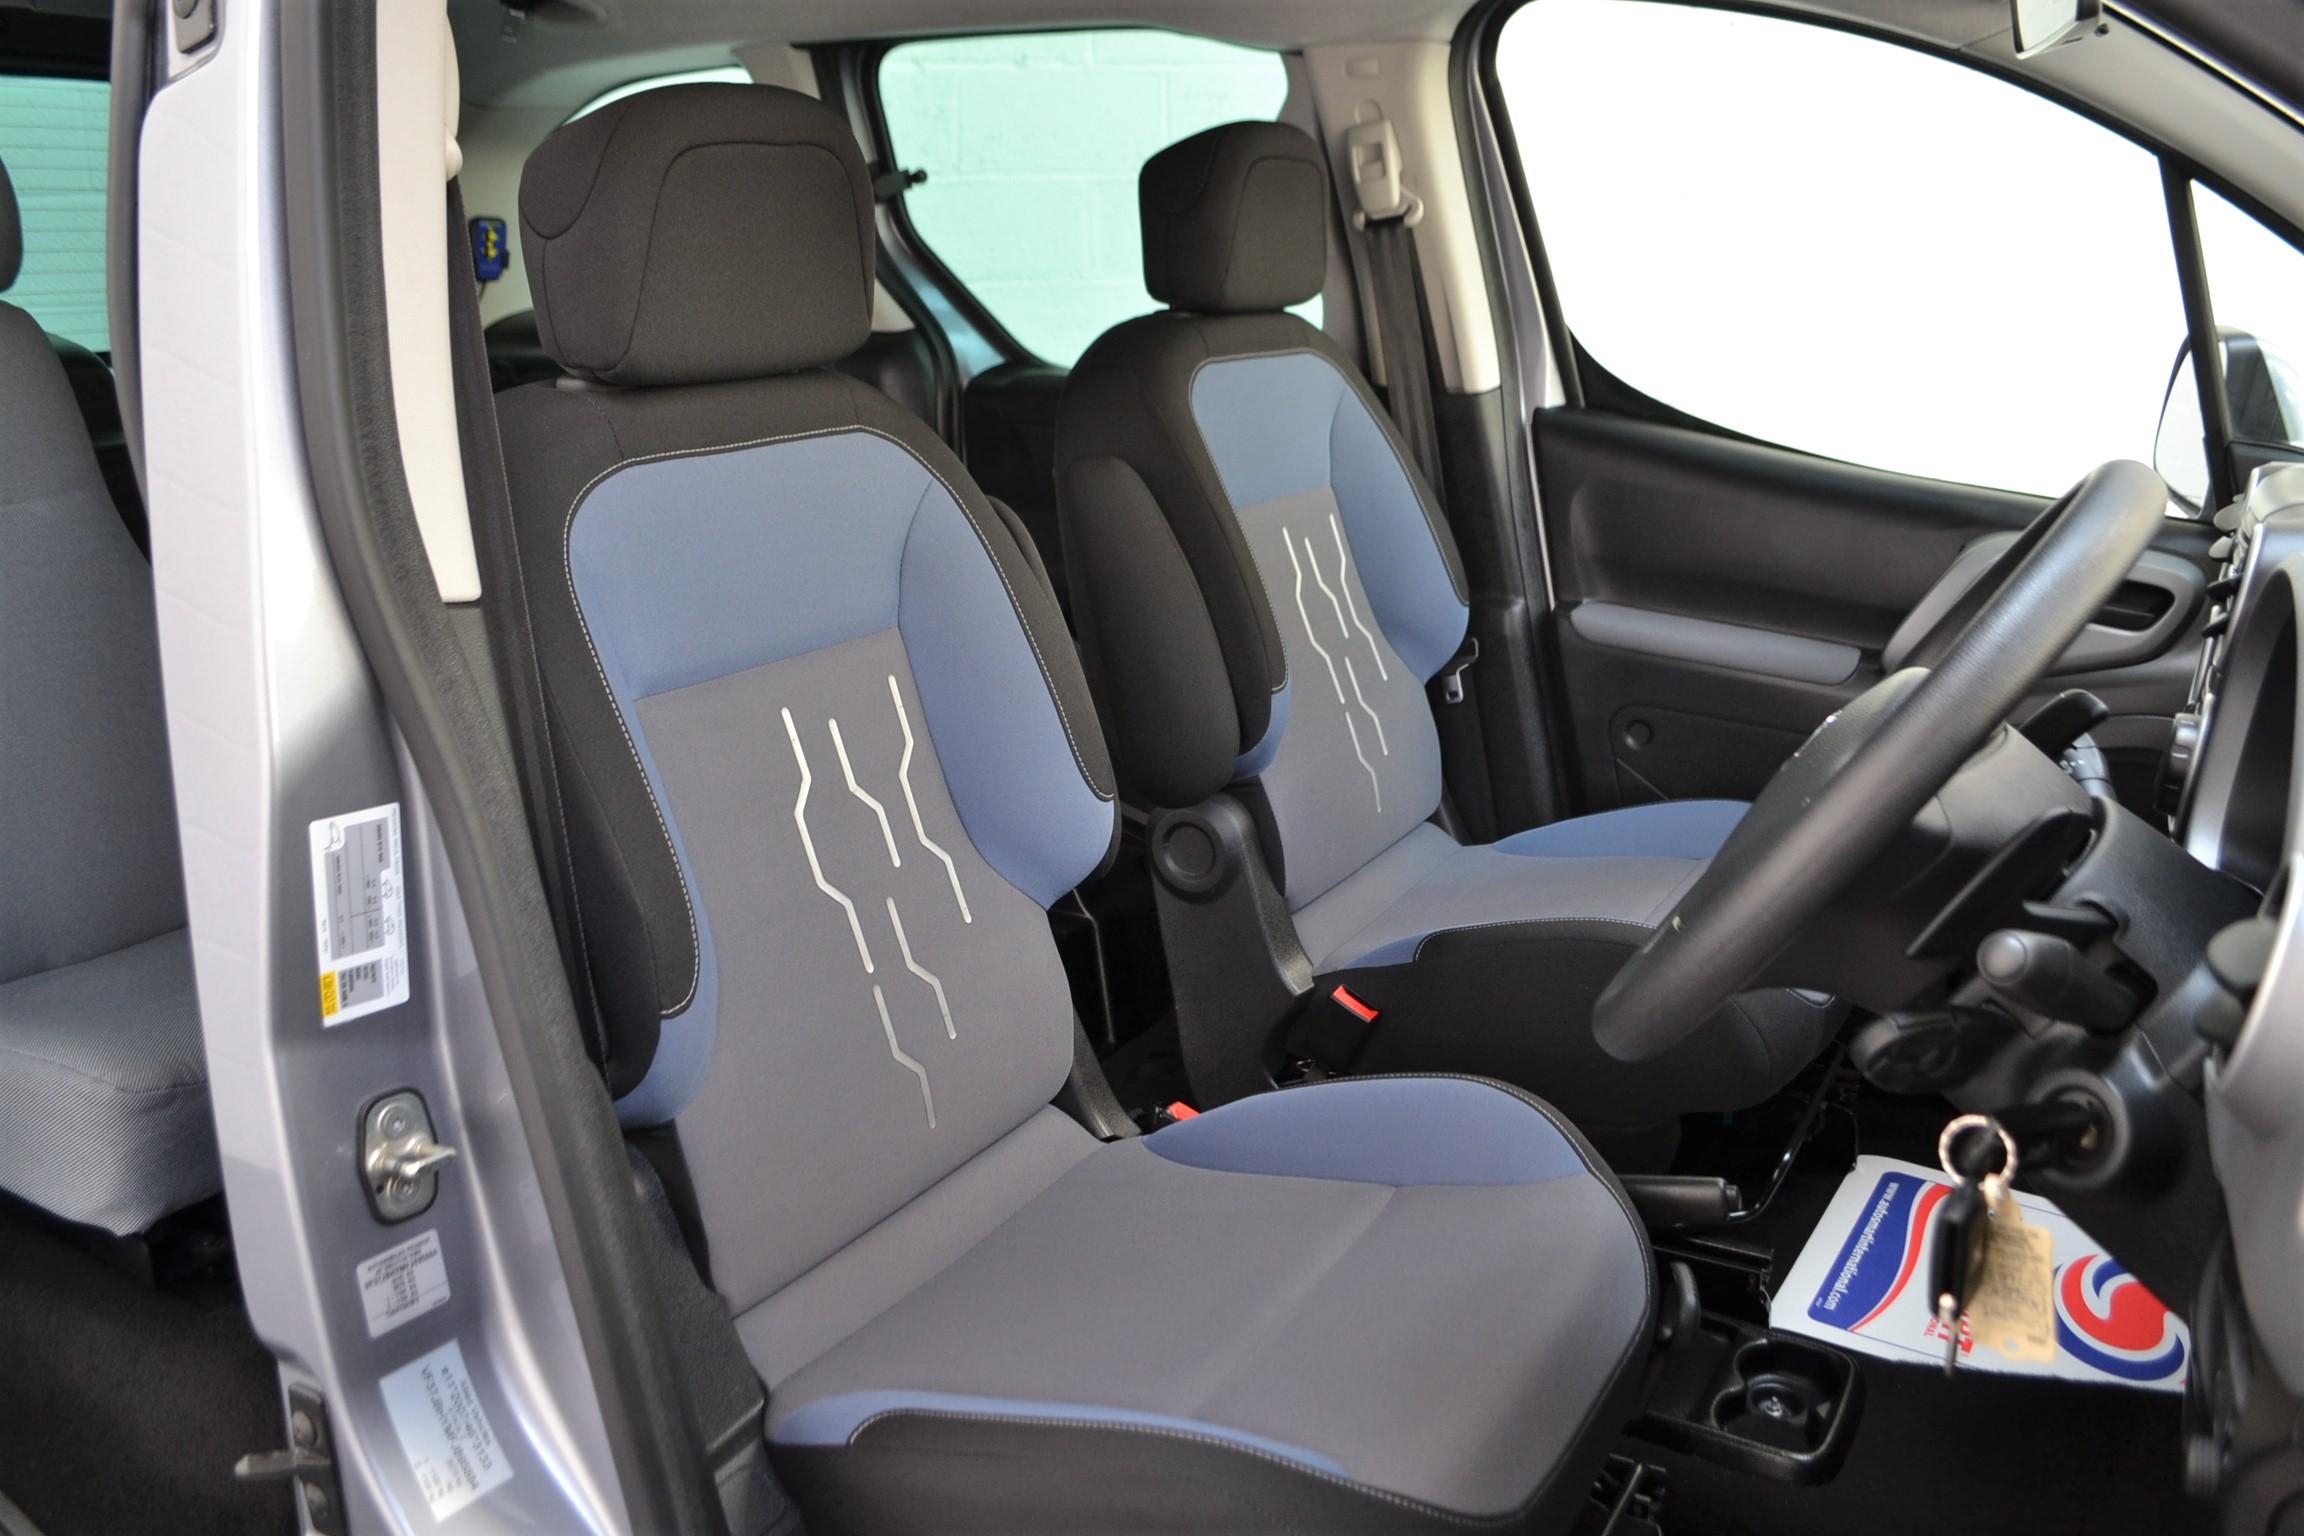 WAV Cars For Sale Bristol Wheelchair Accessible Vehicles Used For Sale Somerset Devon Dorset Bath Peugeot Partner Auto1